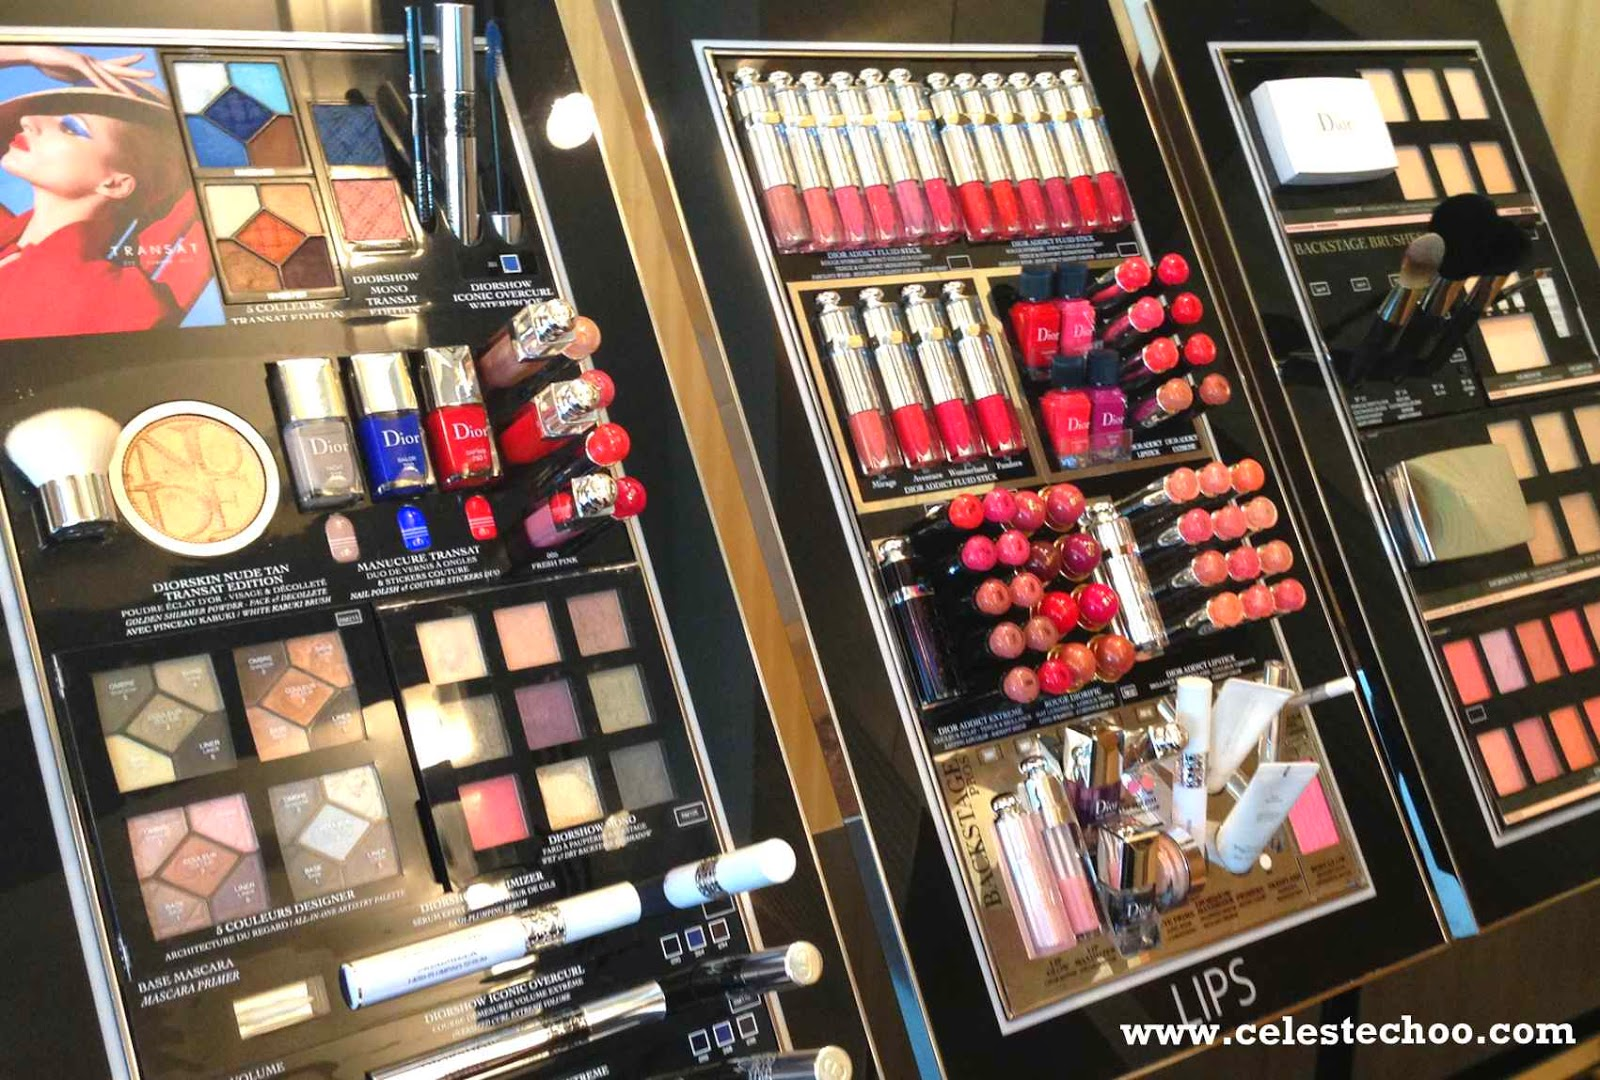 Dior_beauty_makeup_workshop_lipstick_eye_primer_mascara ·  Dior_beauty_makeup_workshop_diorskin_forever_foundation